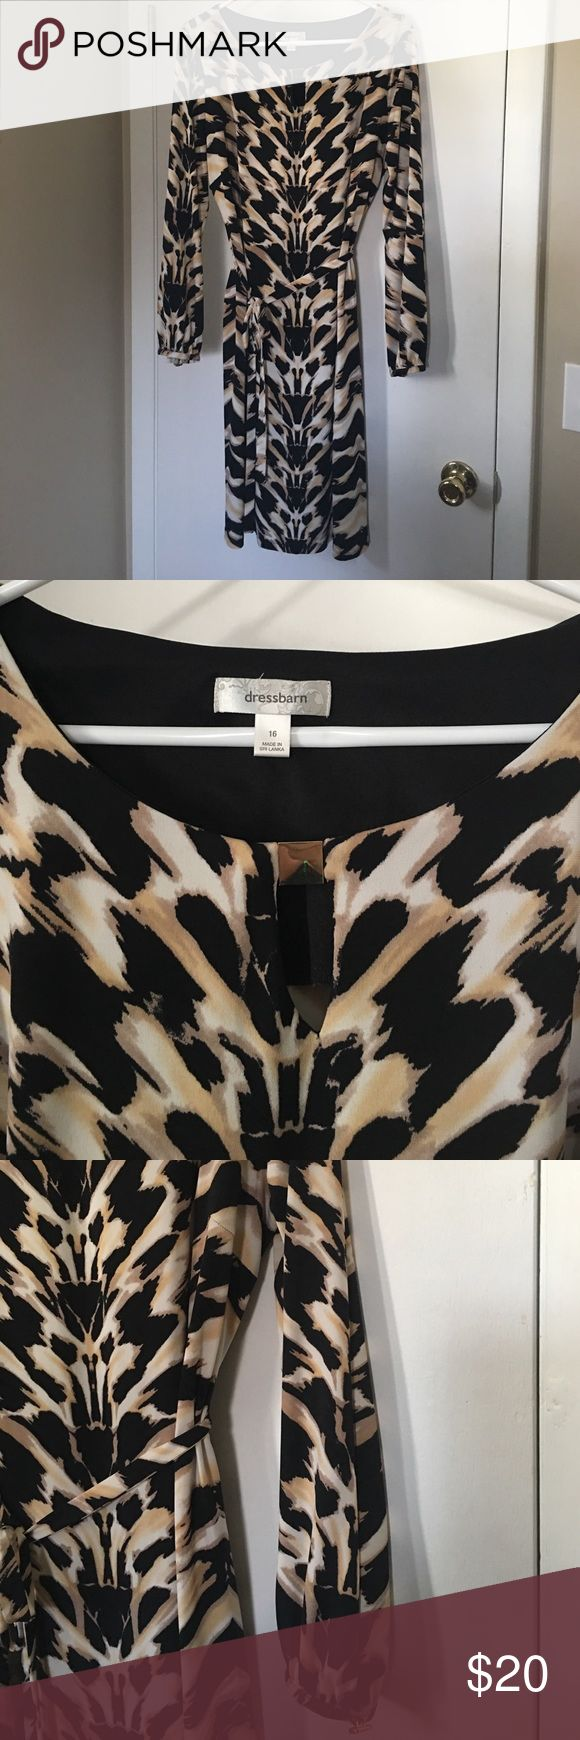 Dress Barn Long Sleeve Animal Print Dress - Sz 16 Long sleeve, animal print dress from Dress Barn - Size 16 - Worn once or twice - Excellent condition Dress Barn Dresses Midi